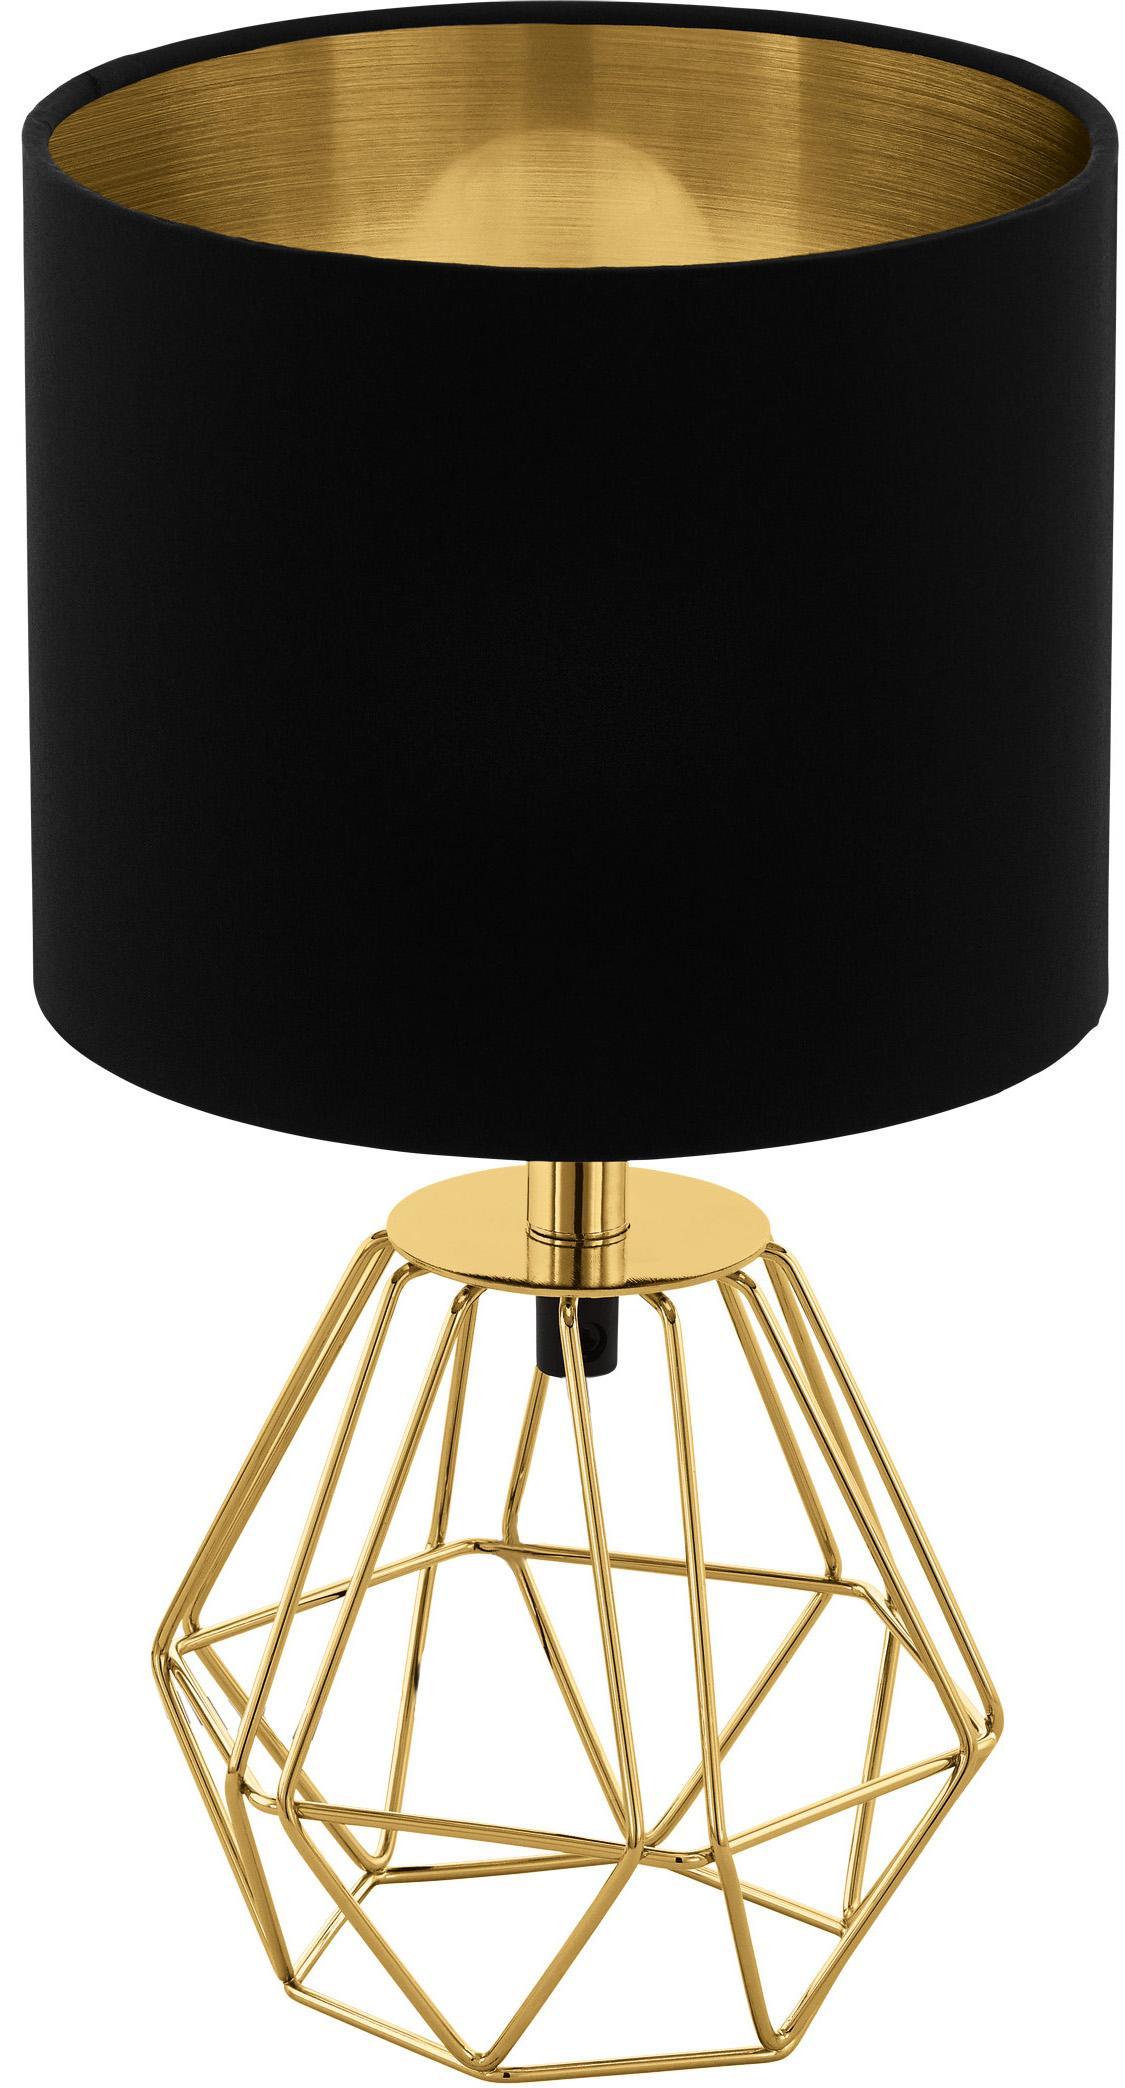 Tafellamp Phil in zwart-goudkleur, Lampvoet: vermessingd metaal, Zwart, goudkleurig, Ø 17 cm